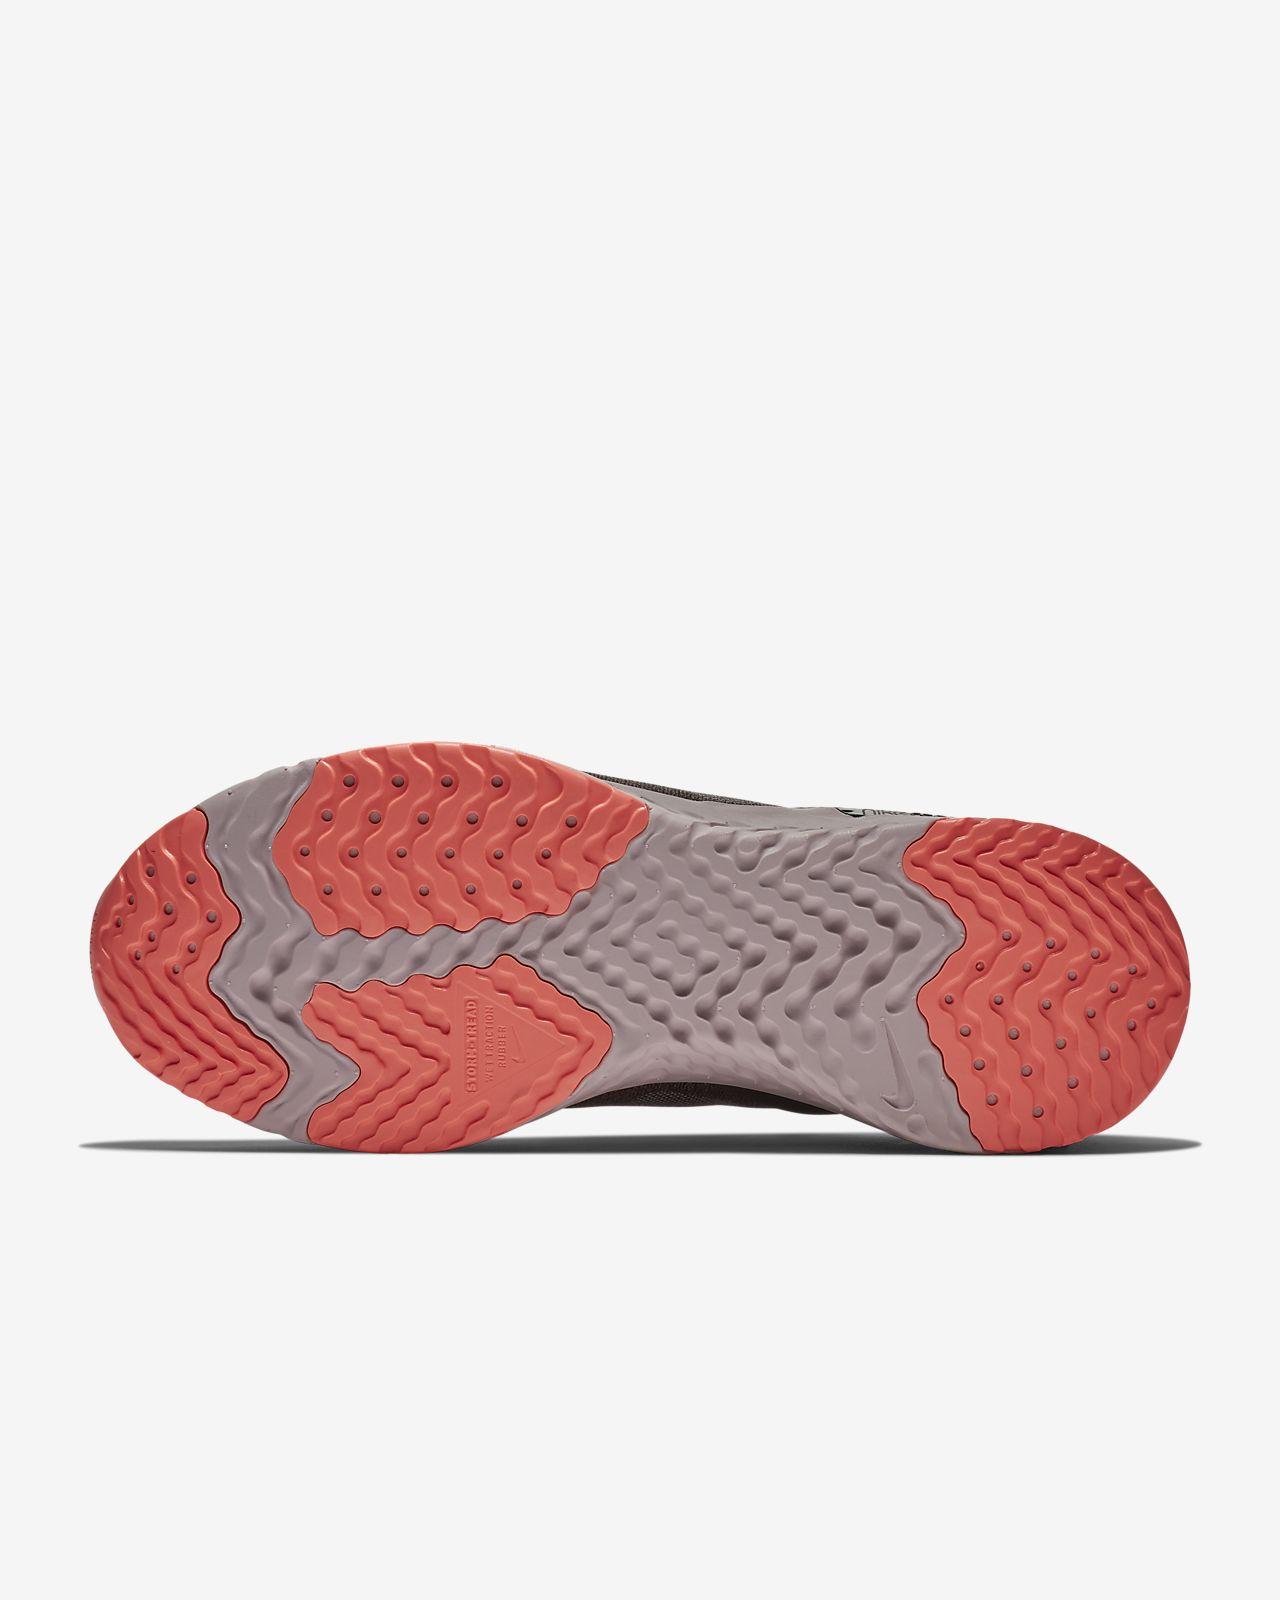 Tienda Nike Free RN 2018 Shield Water Repellent, Zapatillas